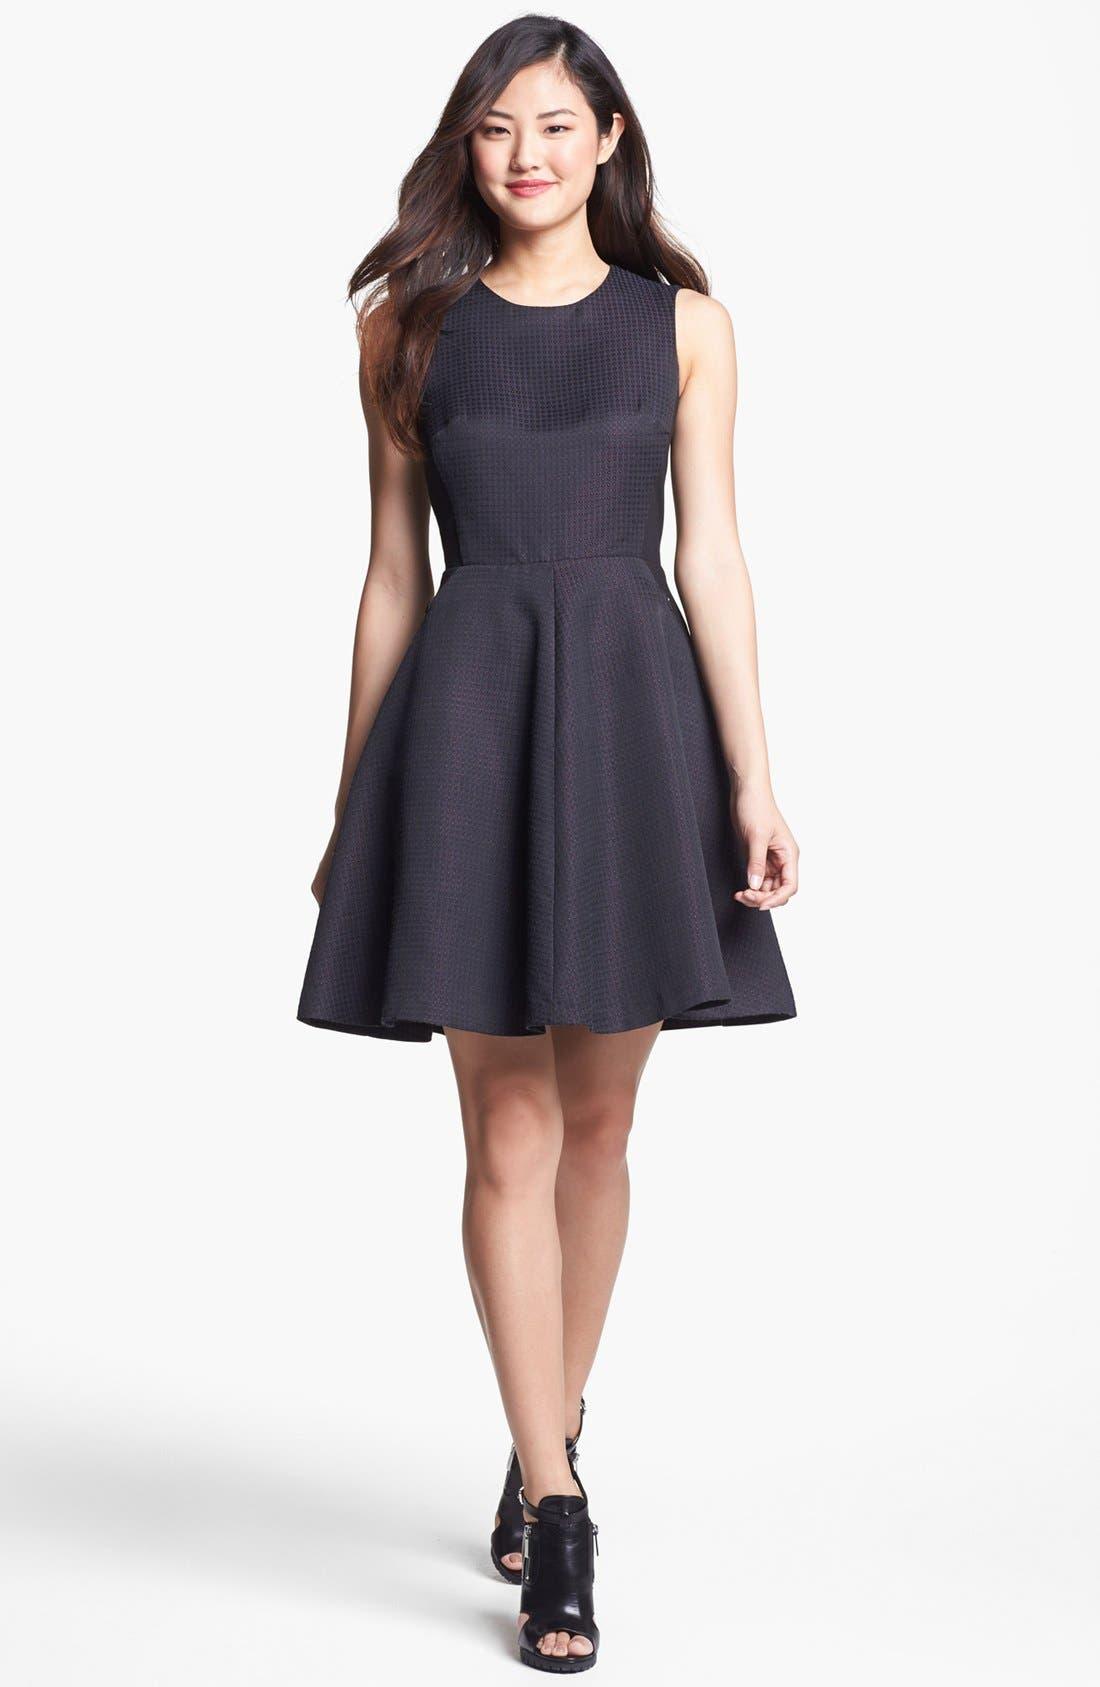 Alternate Image 1 Selected - Halogen® Jacquard Fit & Flare Dress (Regular & Petite)